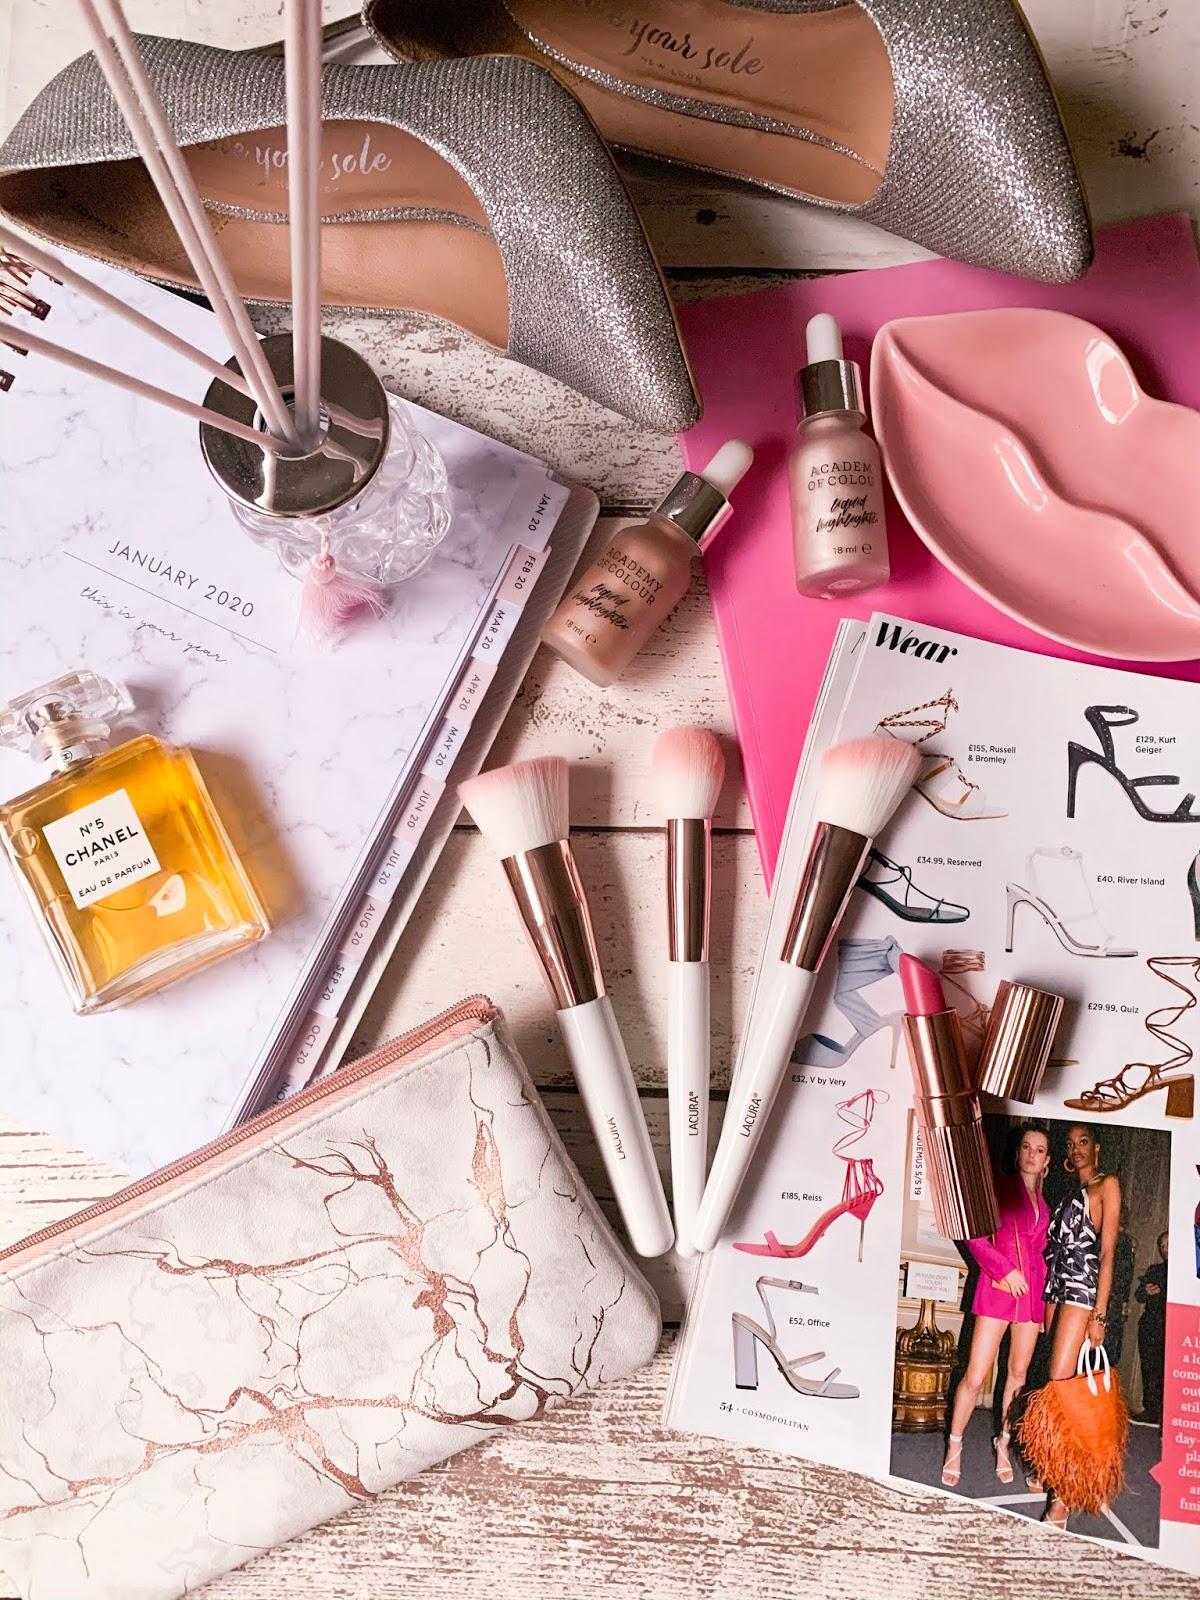 Beauty Flatlay For Beauty Resolutions